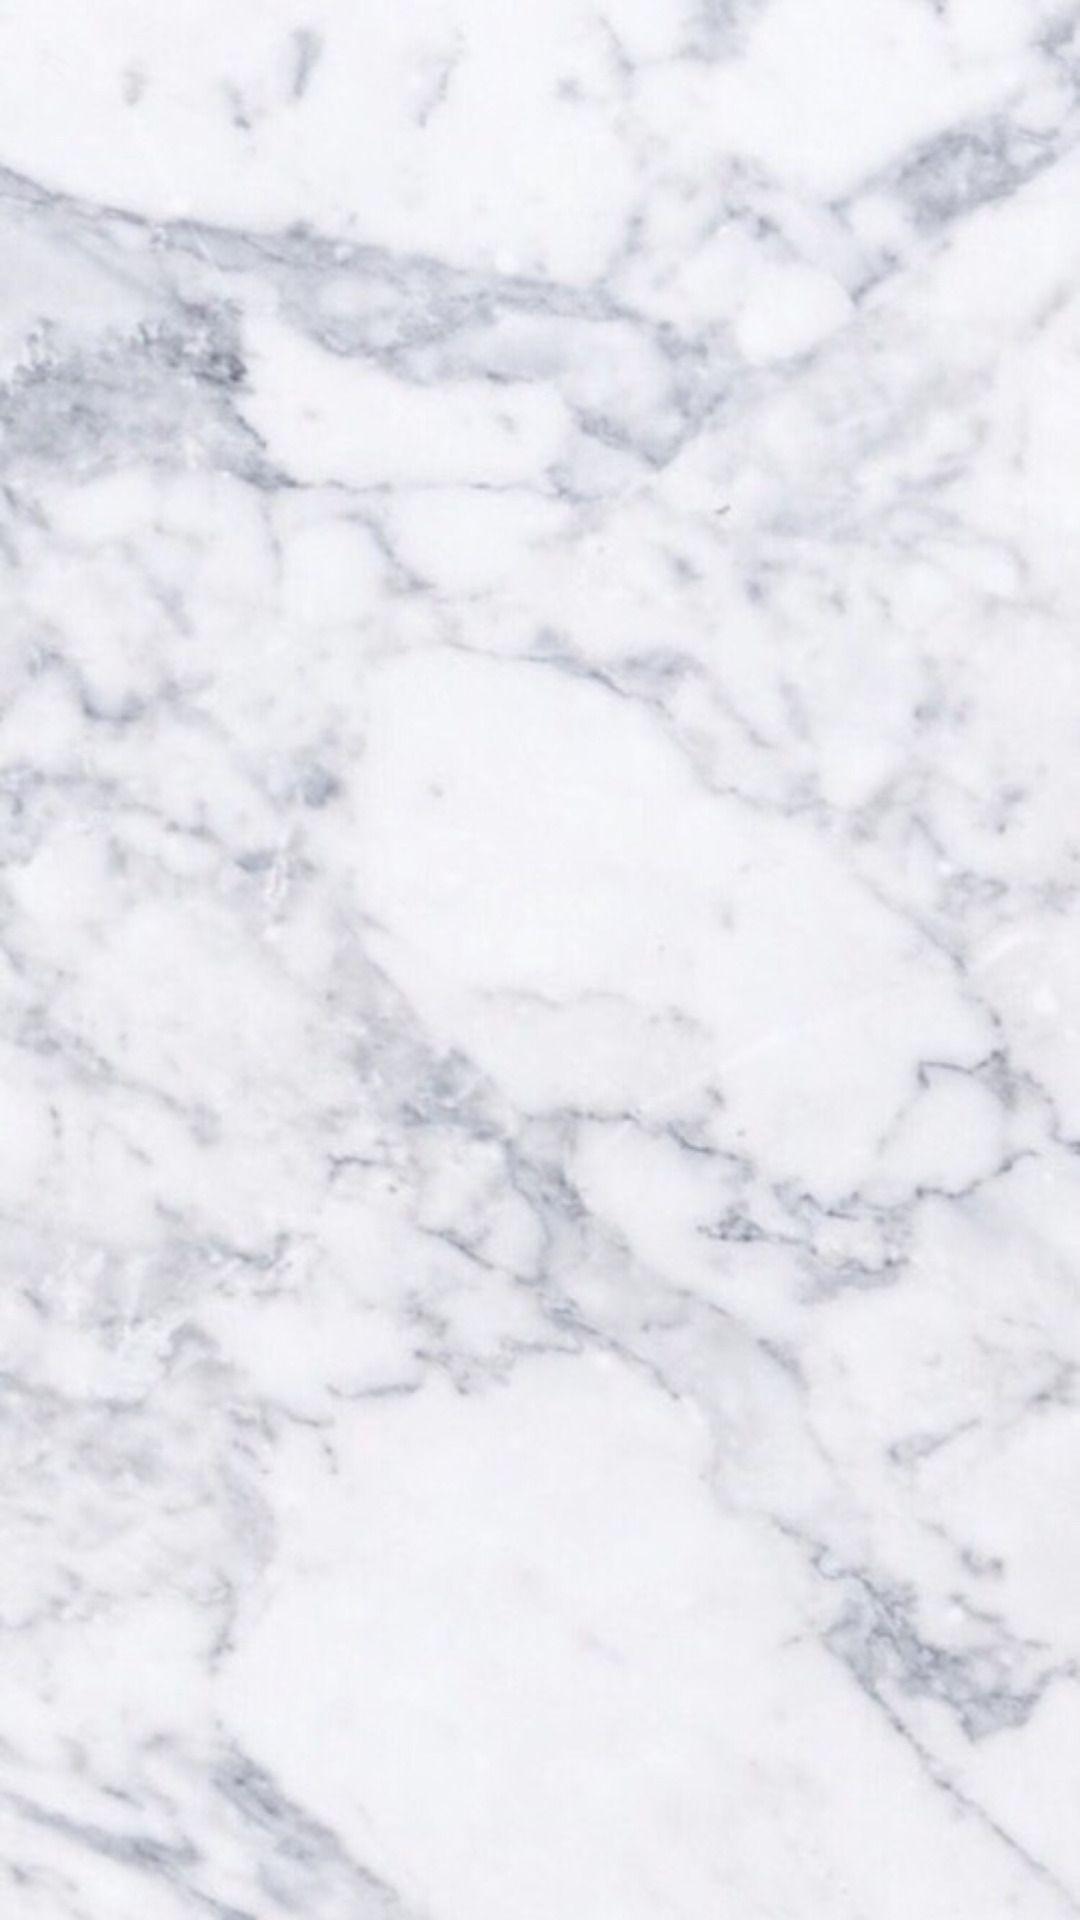 Somerset Prep Auroravd Marble Wallpaper Mountains